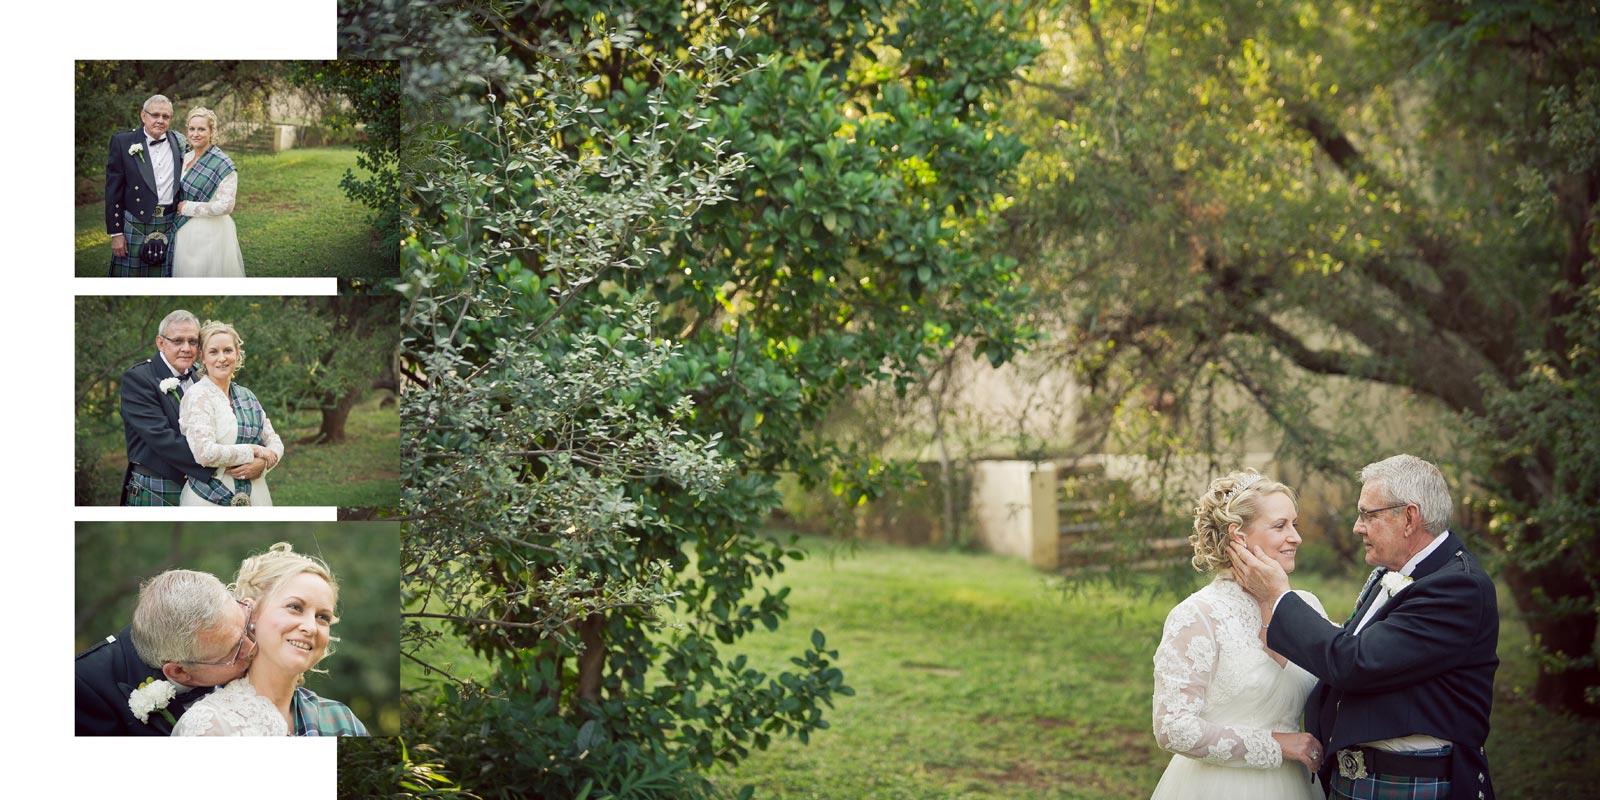 Nathalie Boucry Photography | Deidre and Lister Wedding Album 019